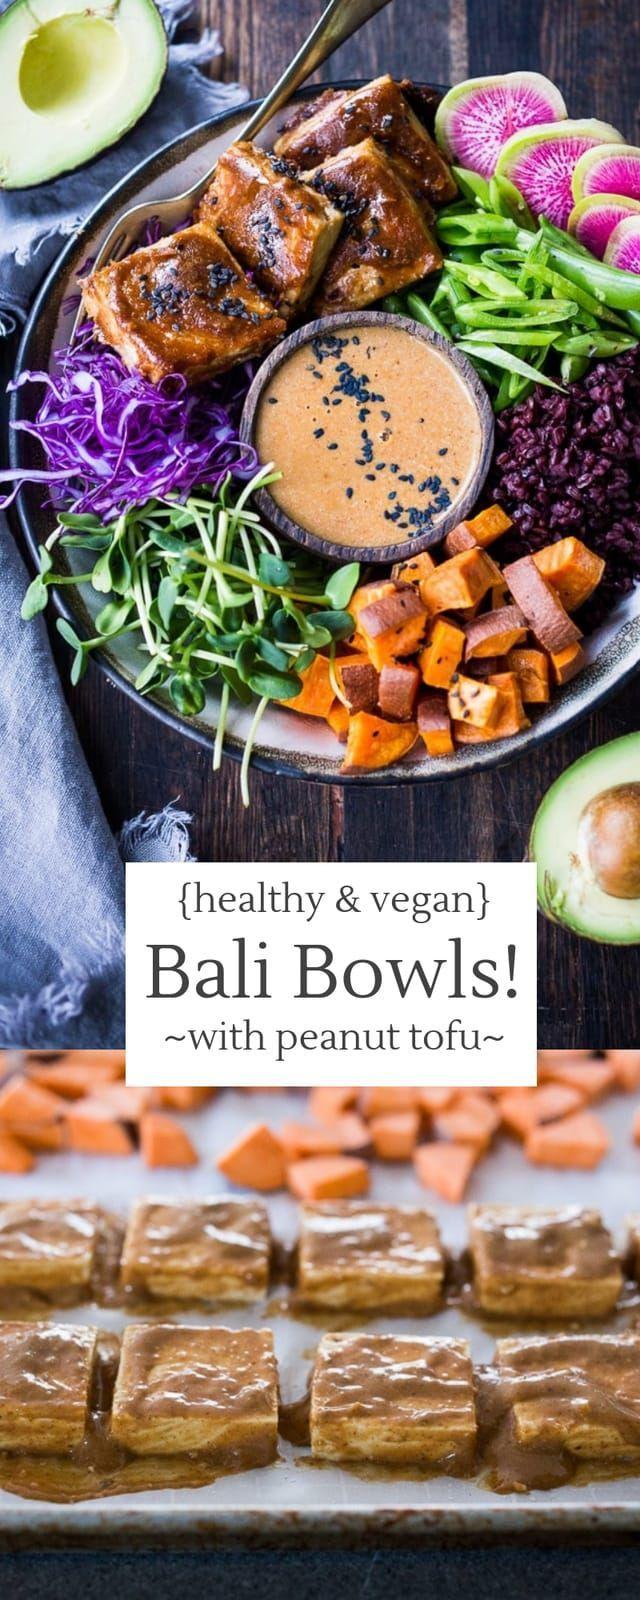 Bali Bowls with Peanut Tofu